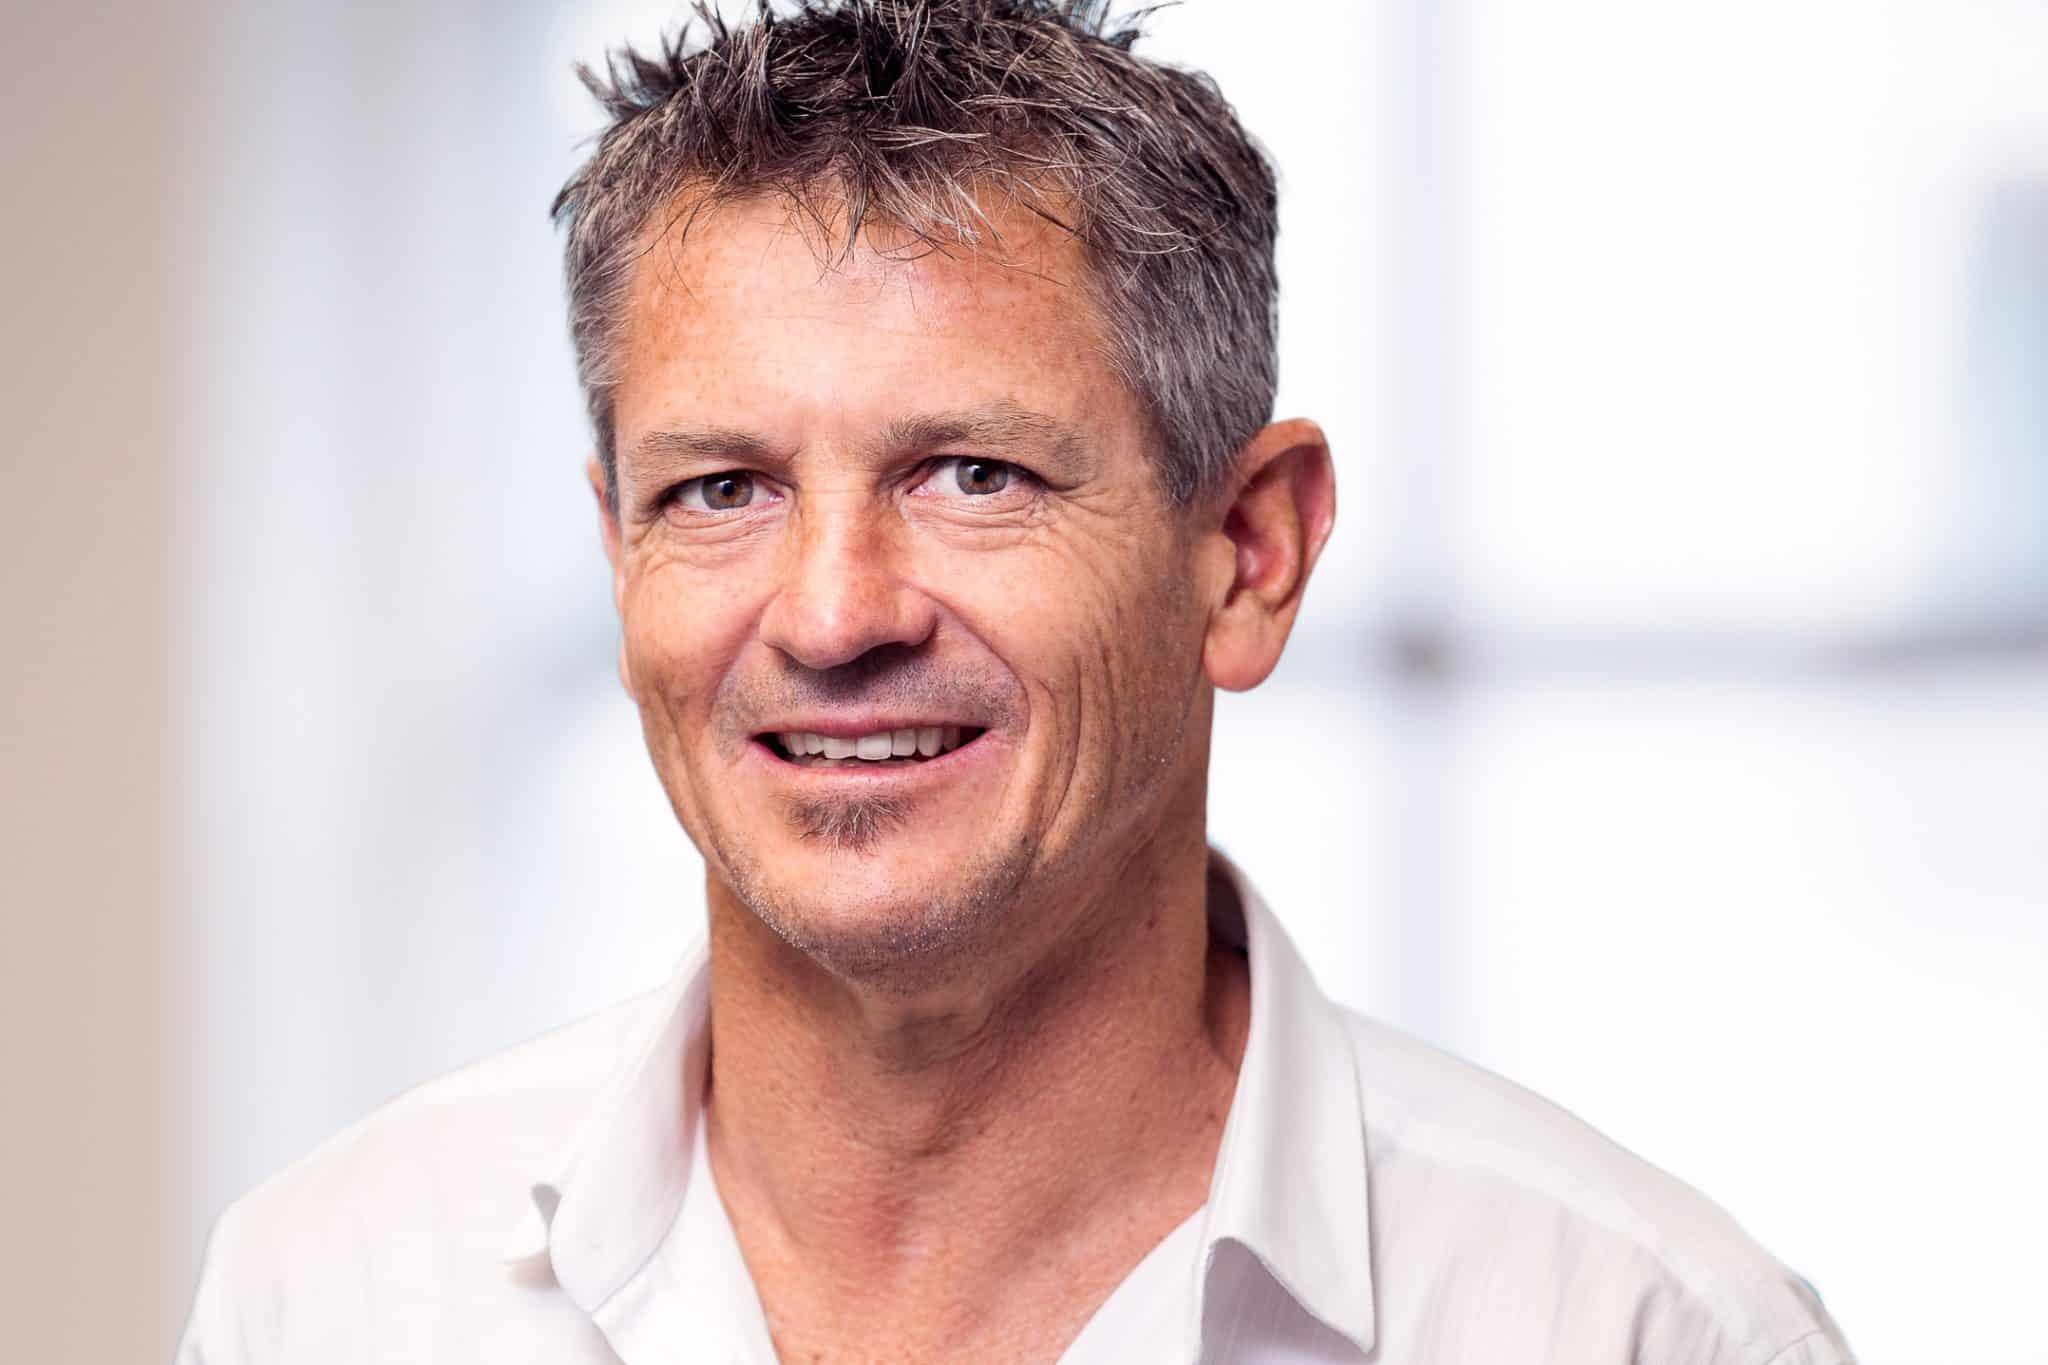 Gavin Broadbent - Registered Valuer for Prendos NZ Limited, Auckland.